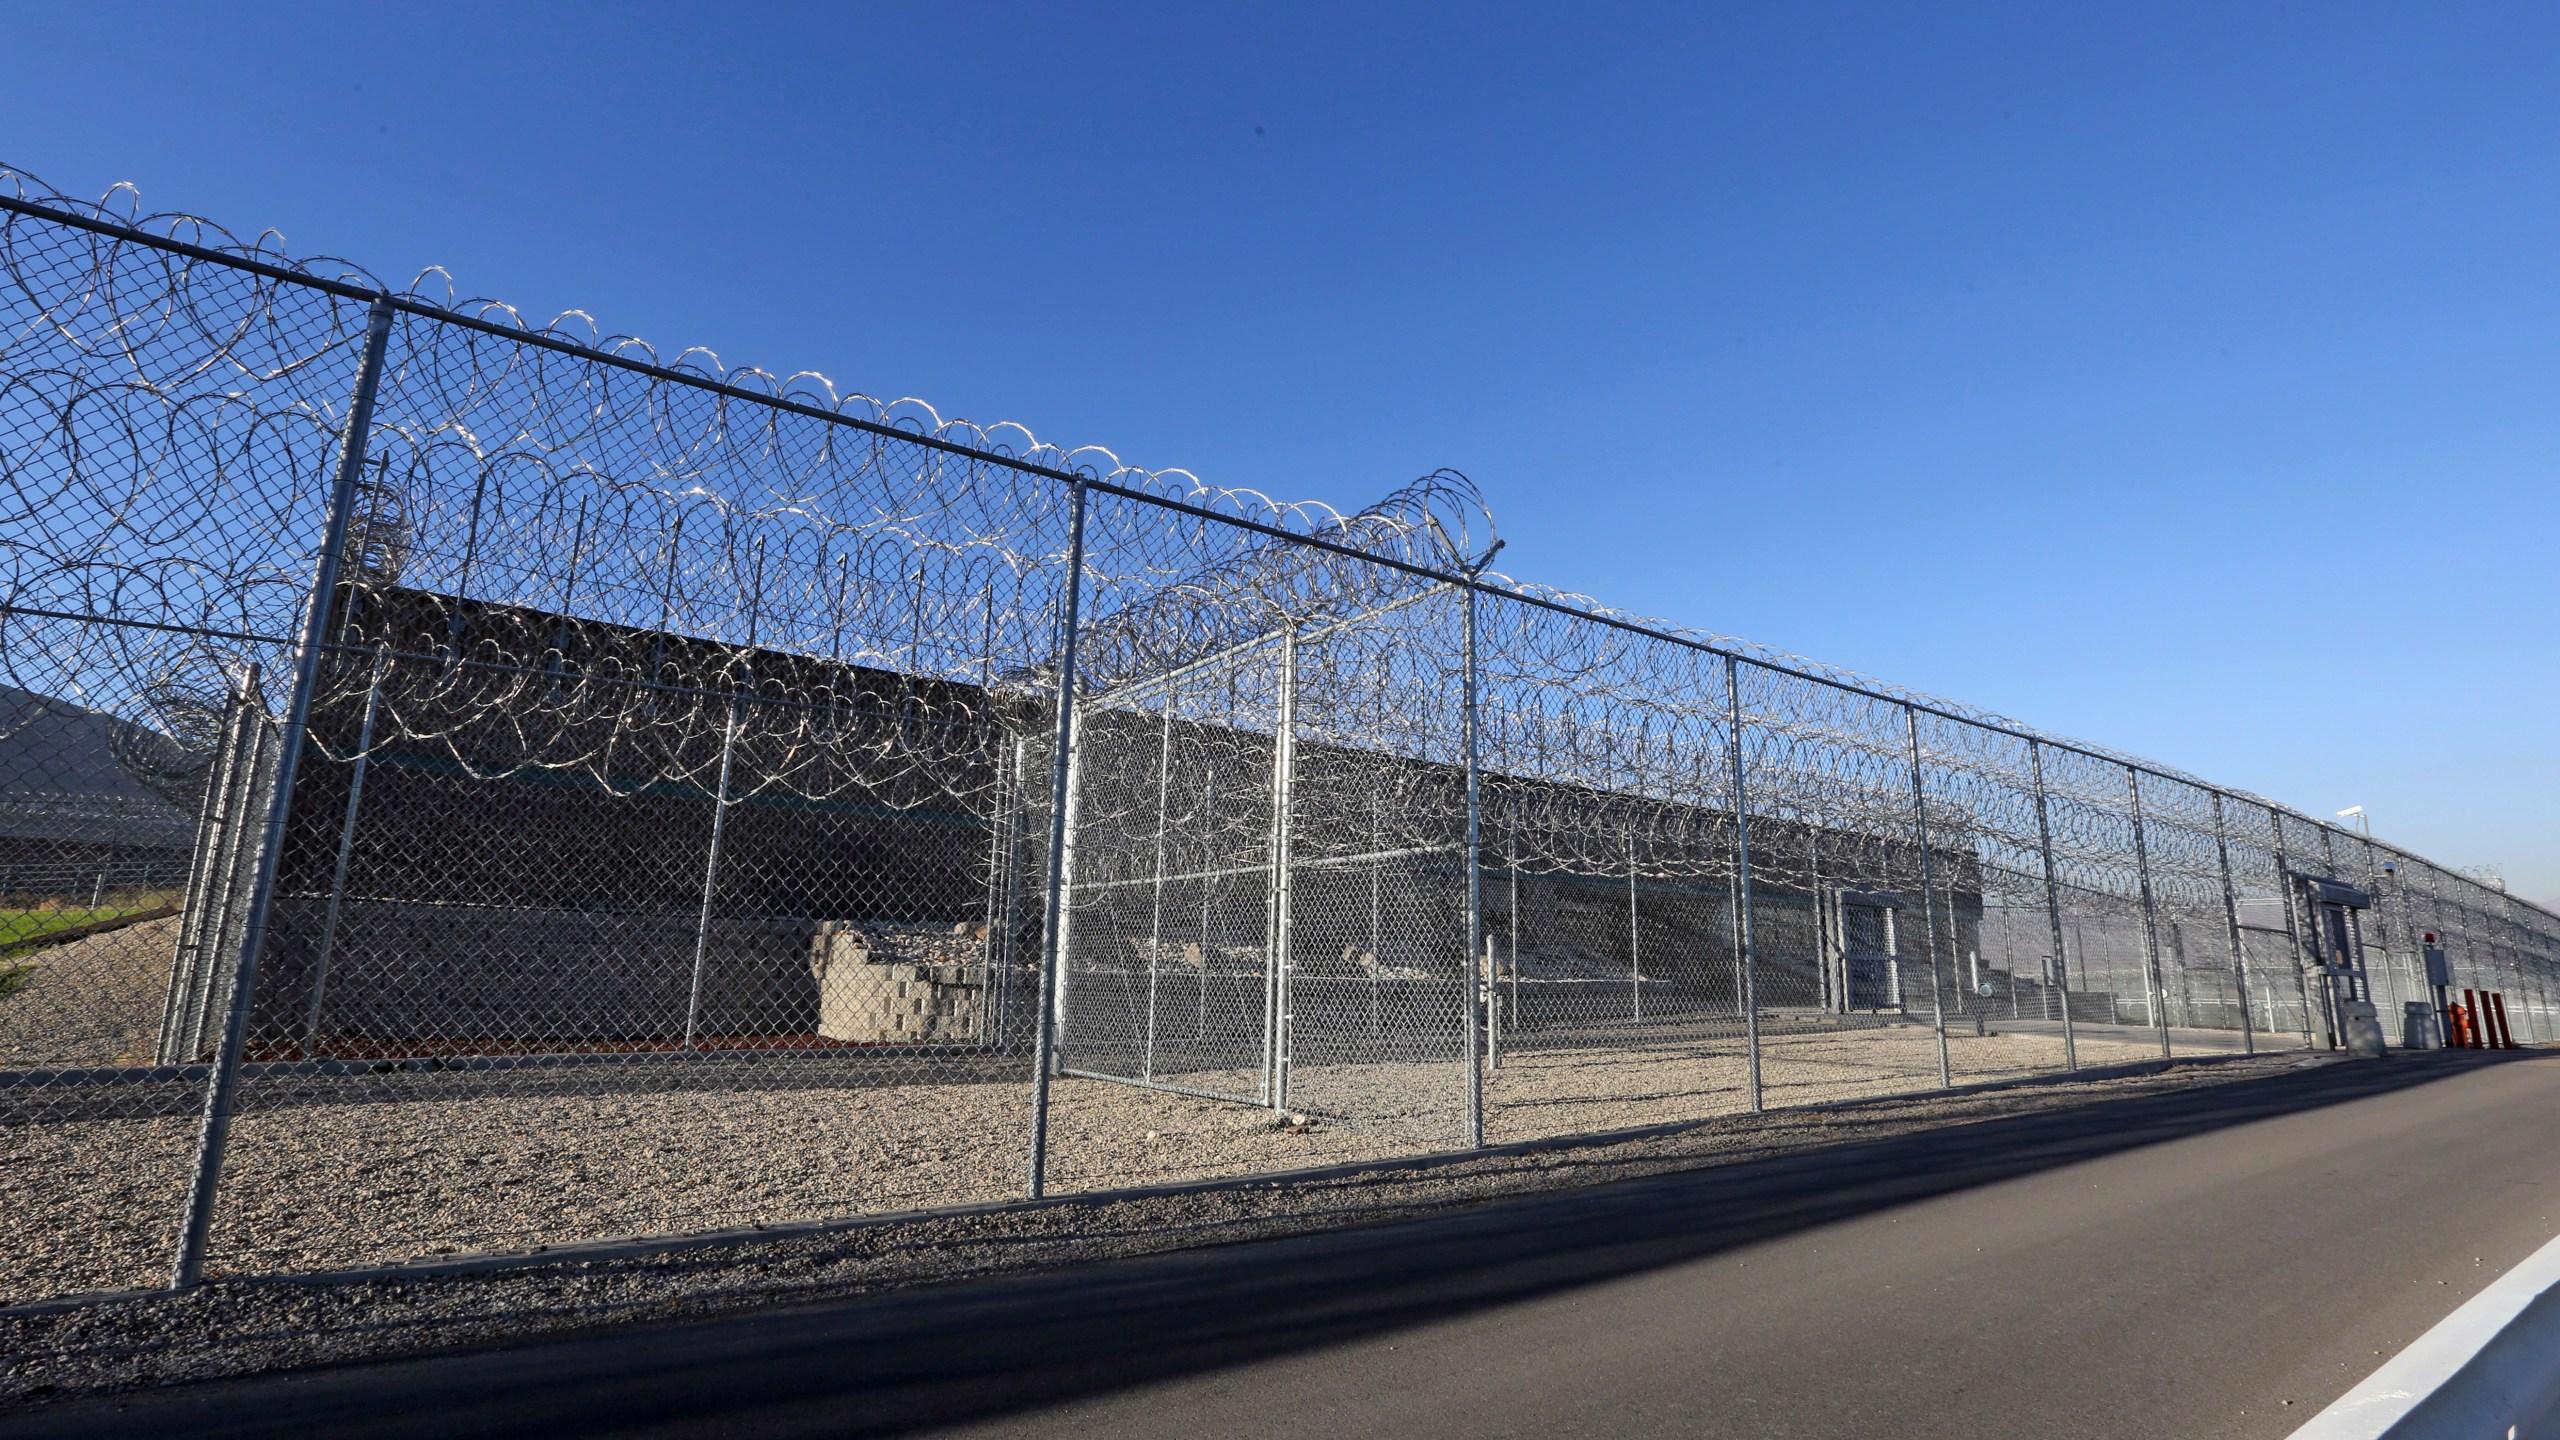 Elizabeth_Smart_Kidnapper-Prison_Release_75500-159532.jpg77551566